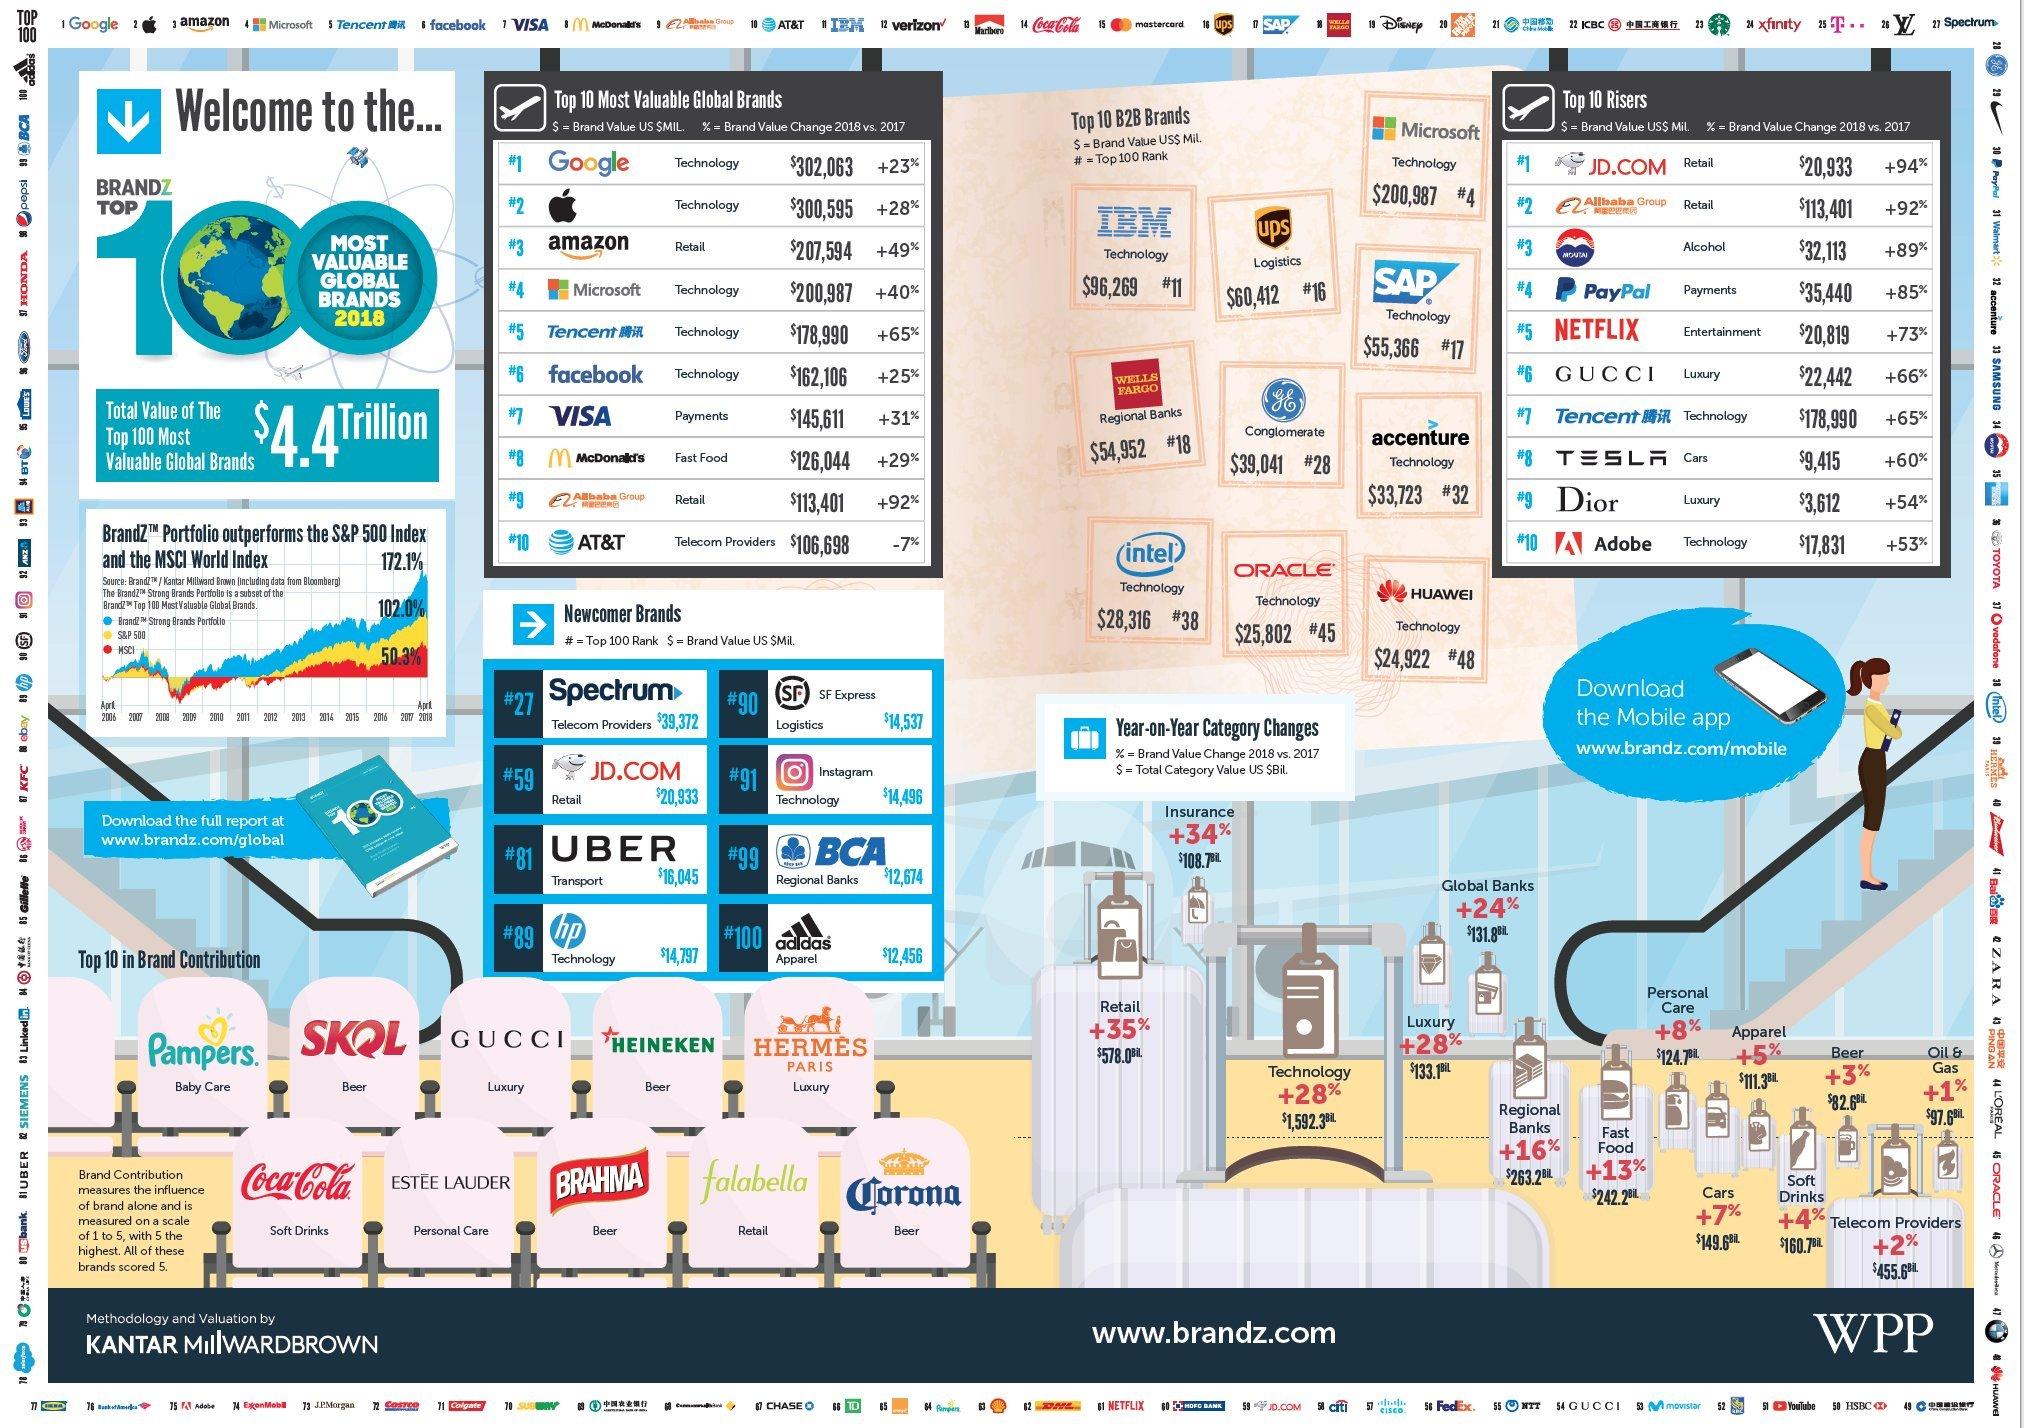 brandz_wpp kantar_rapor_BrandZ Top 100 Most Valuable Global Brands_ bigumigu_